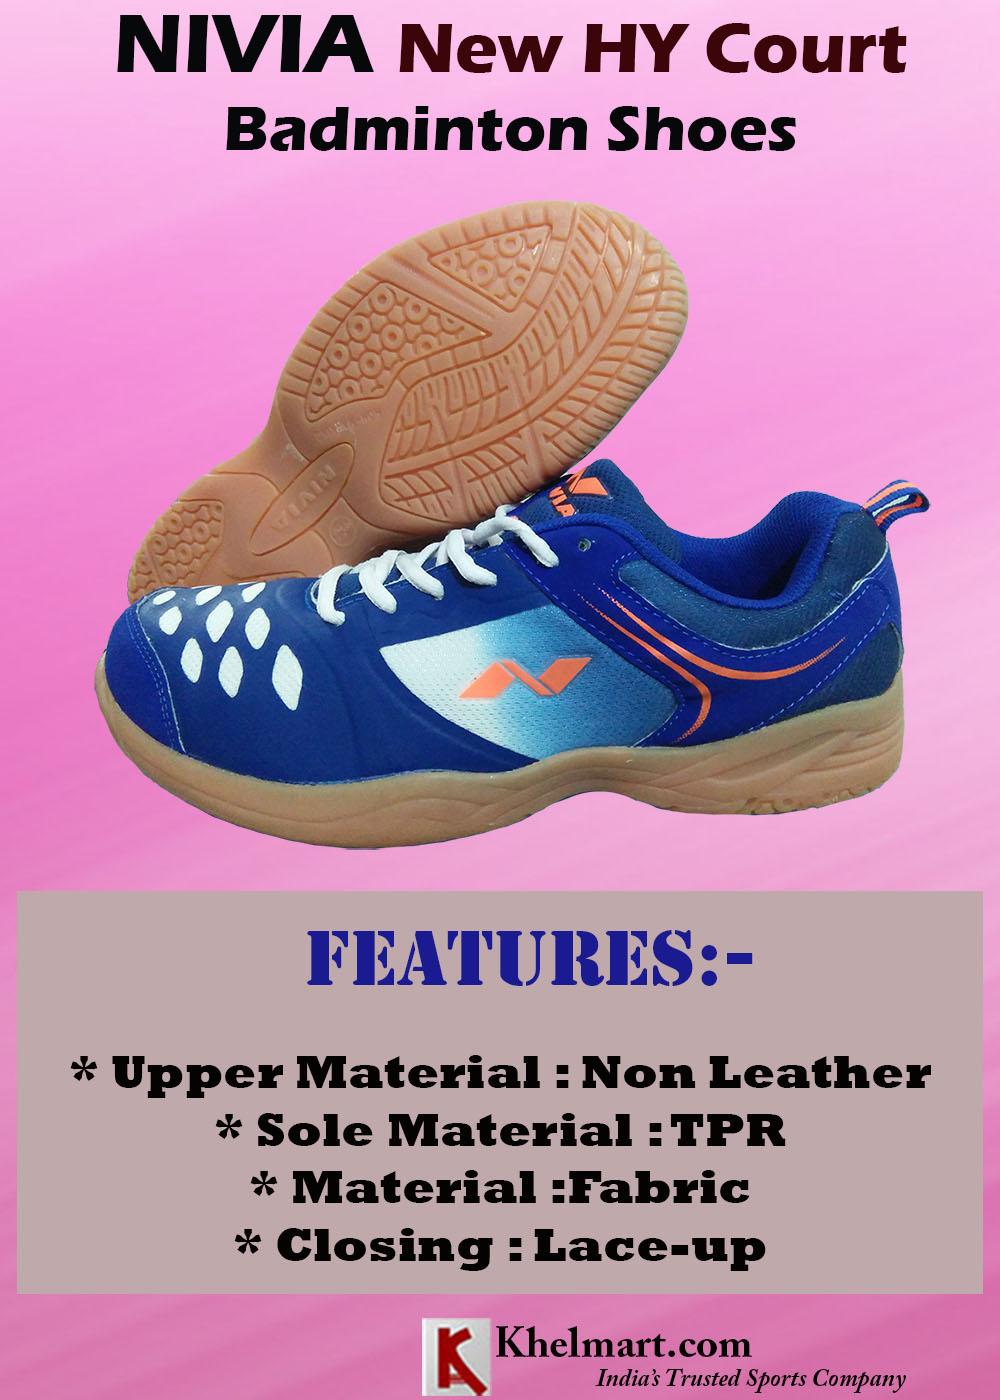 NIVIA New HY Court Badminton Shoes Blue